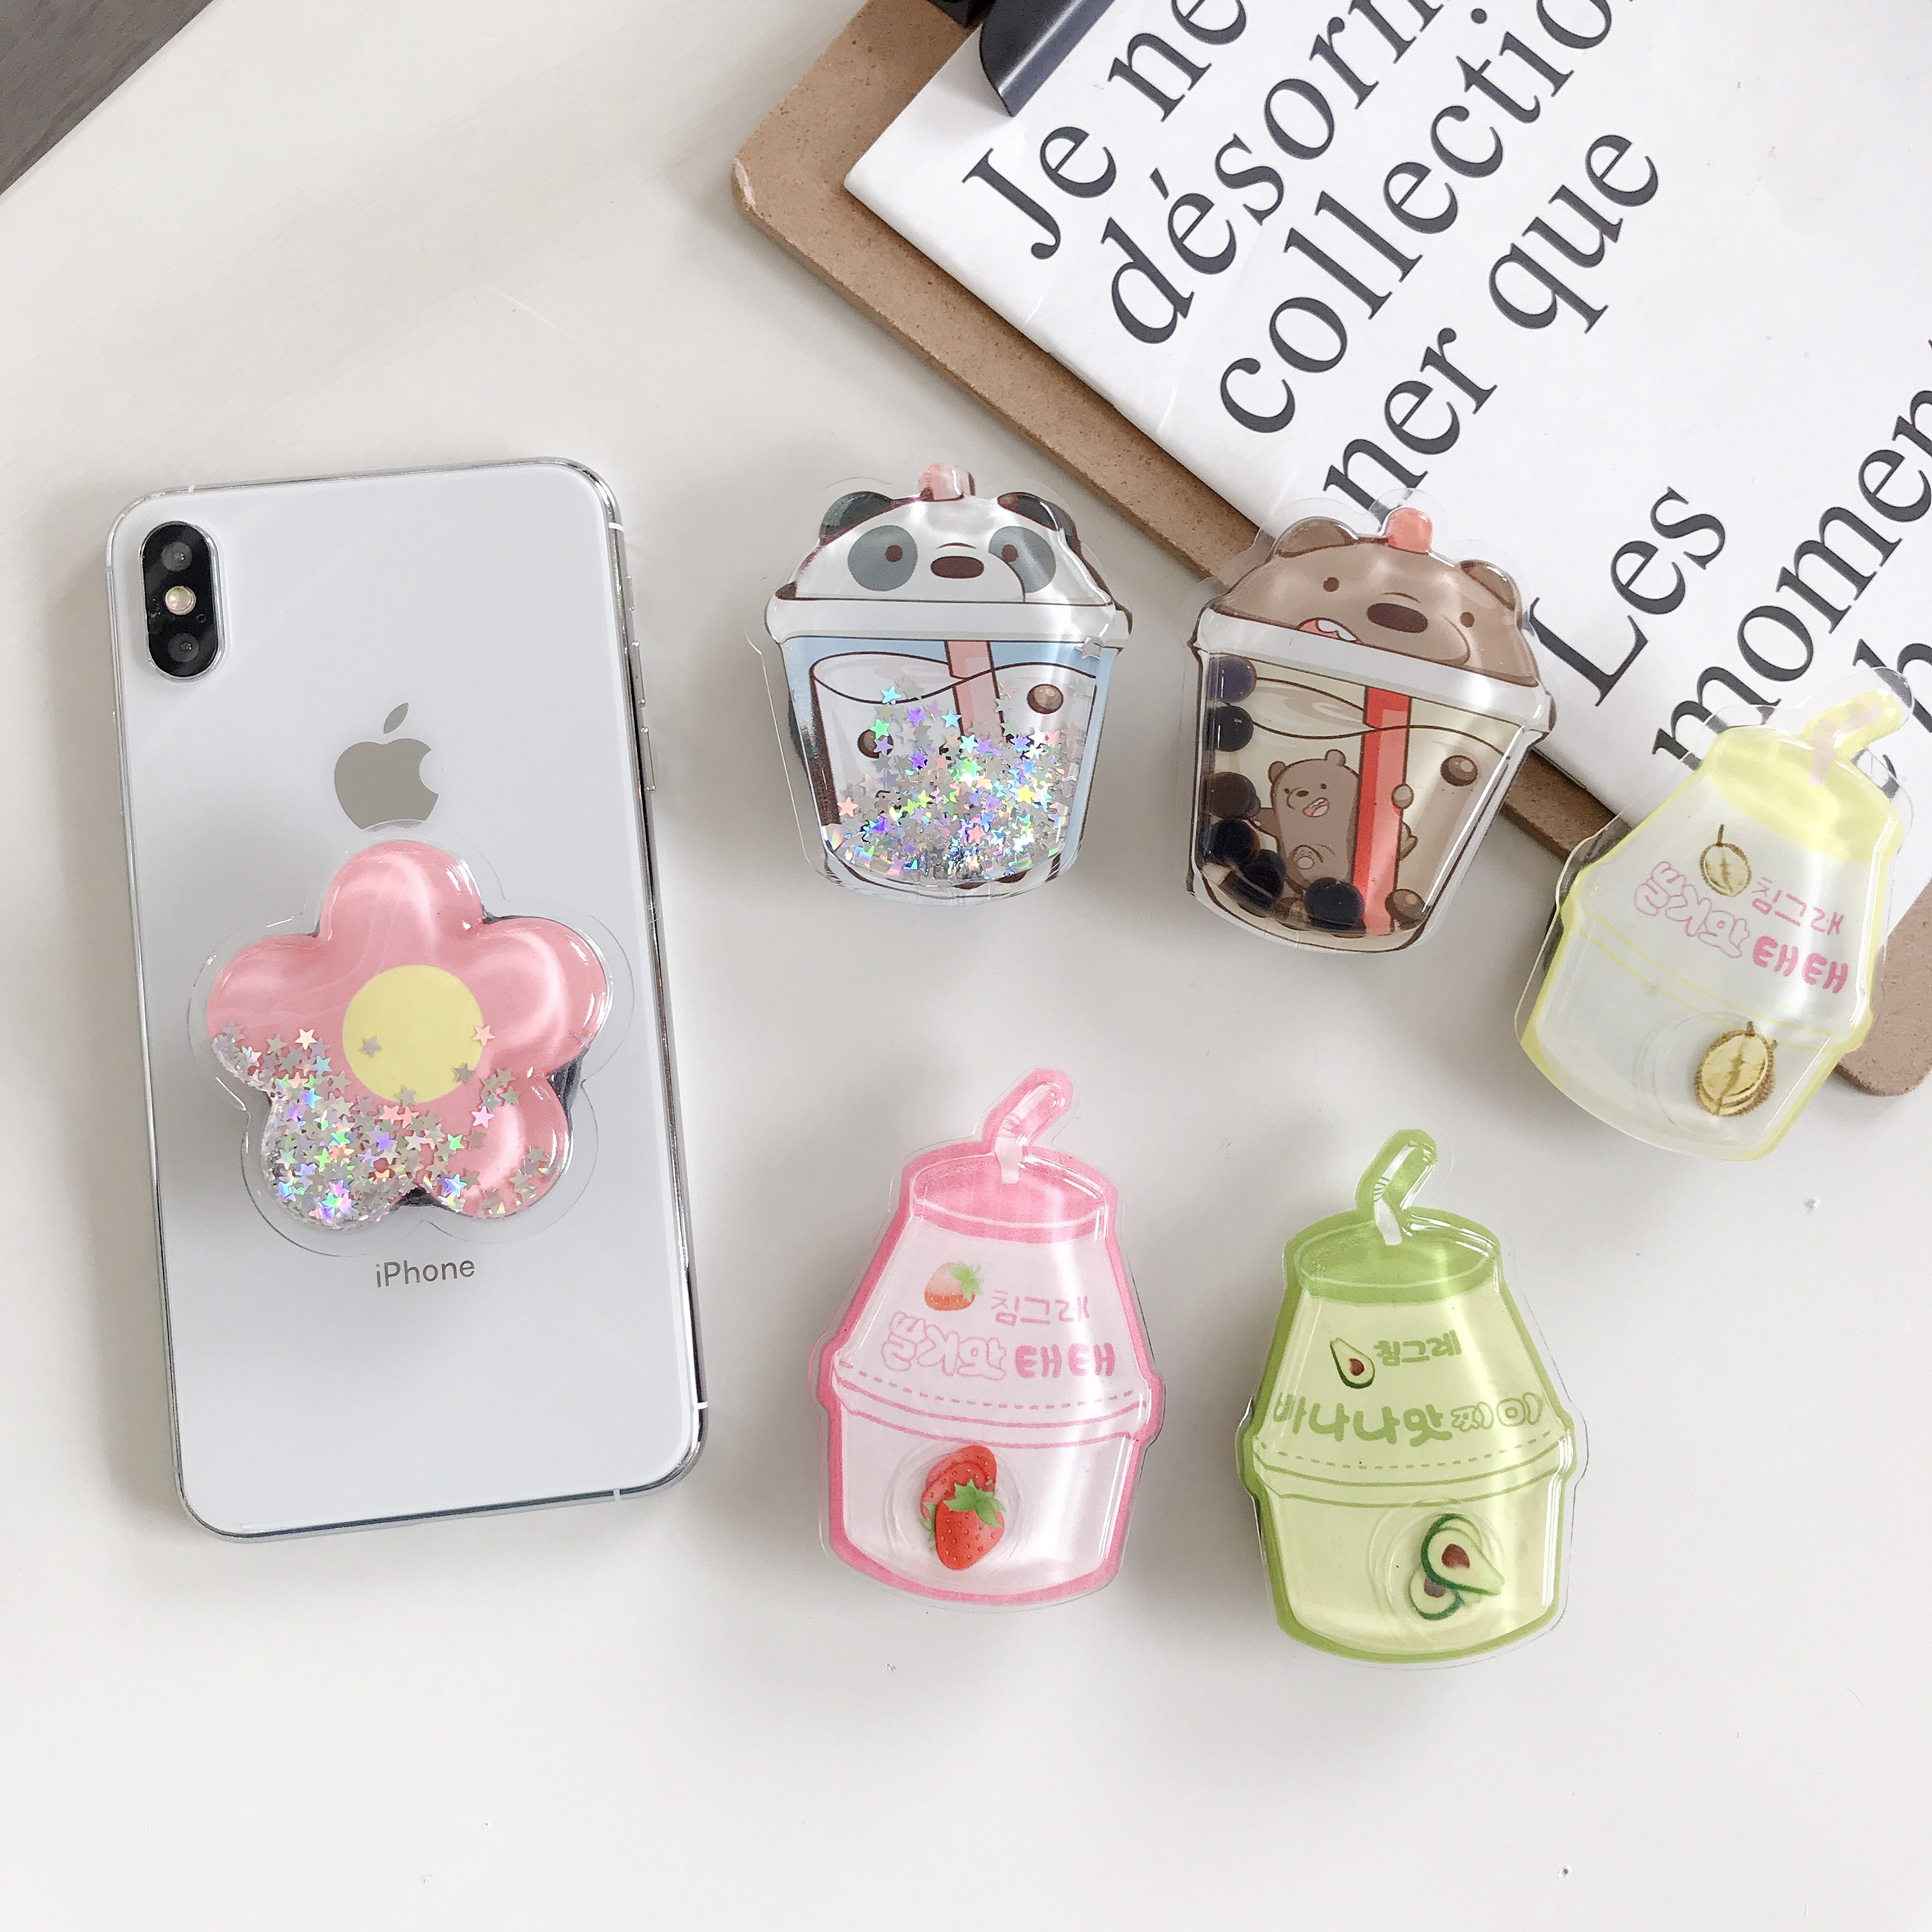 PPOSocket Mobile Phone Soket Stretch Bracket Cartoon Air Bag Phone Expanding Phone Stand Finger Car Phone Holder Pipsocket